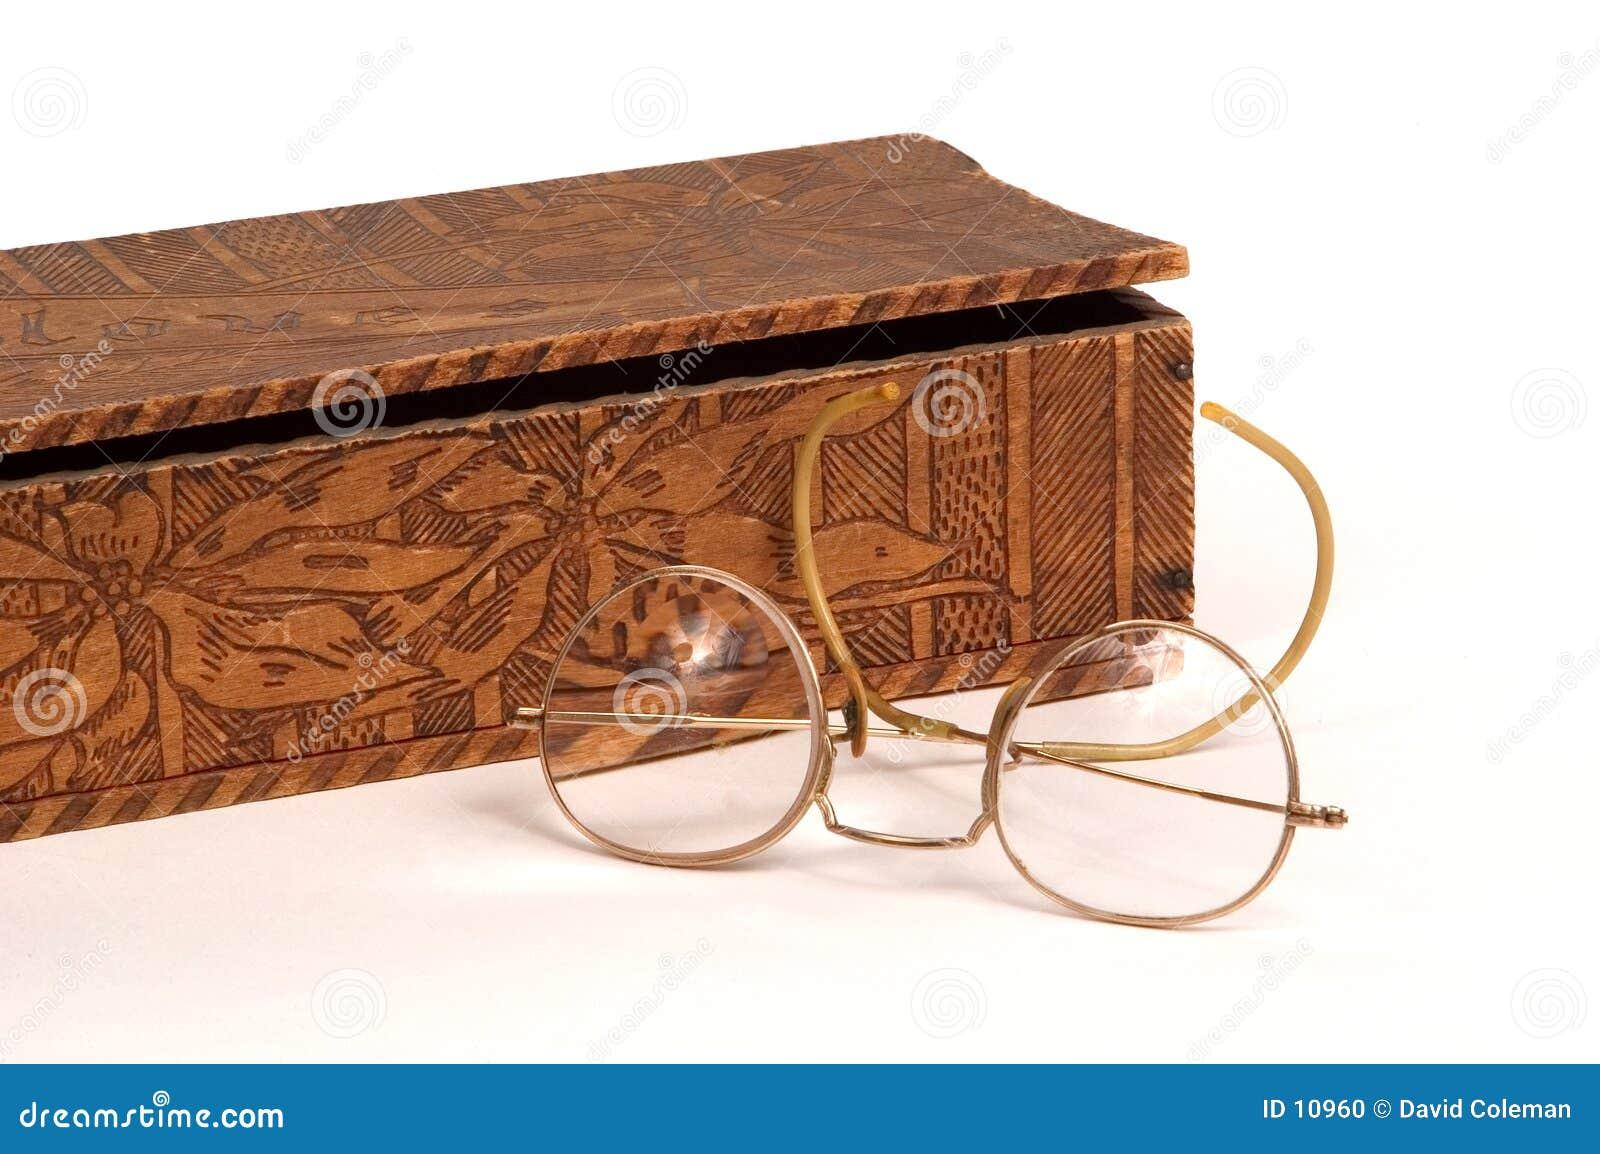 Glove box and antique glasses